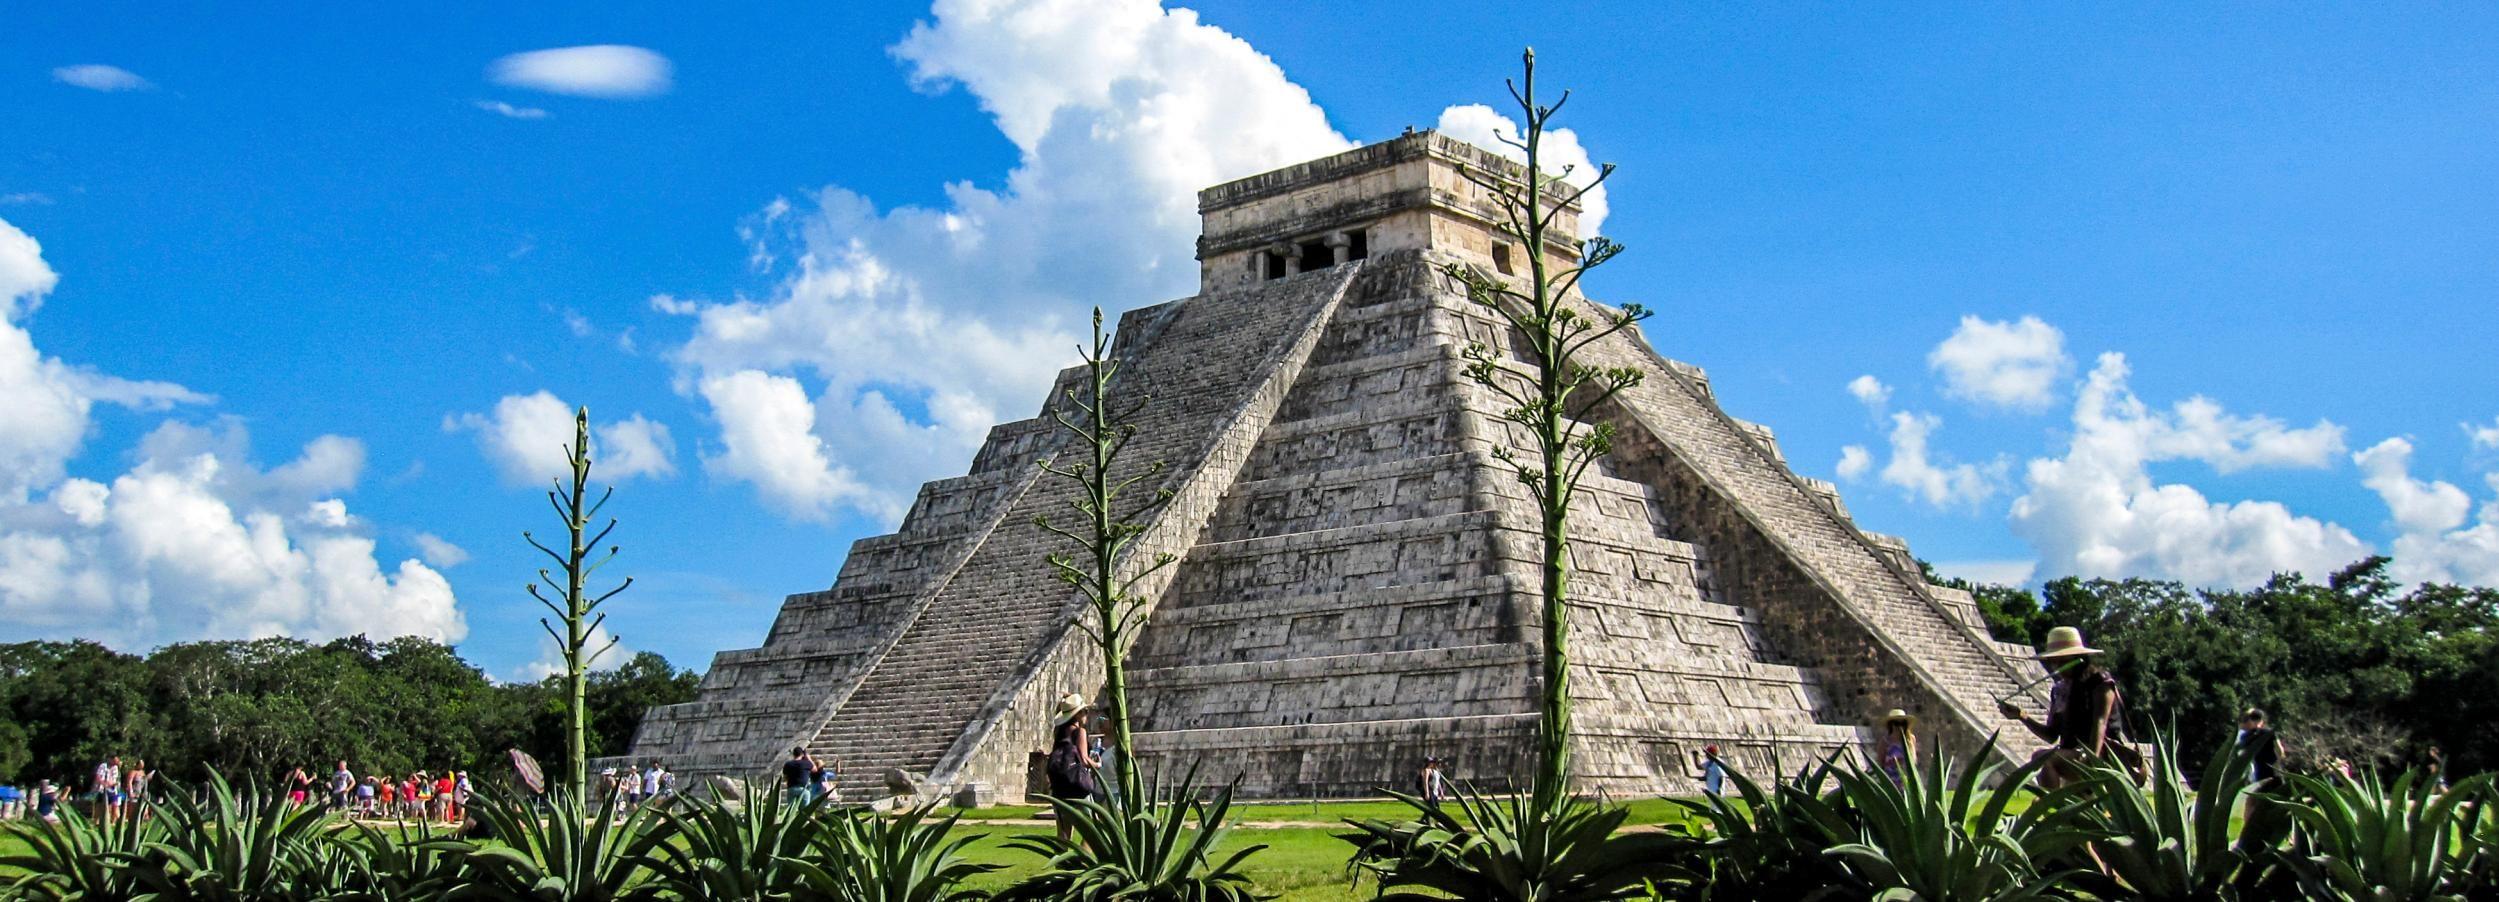 Tour nach Chichén Itzá, Hubiku und Ek'Balam